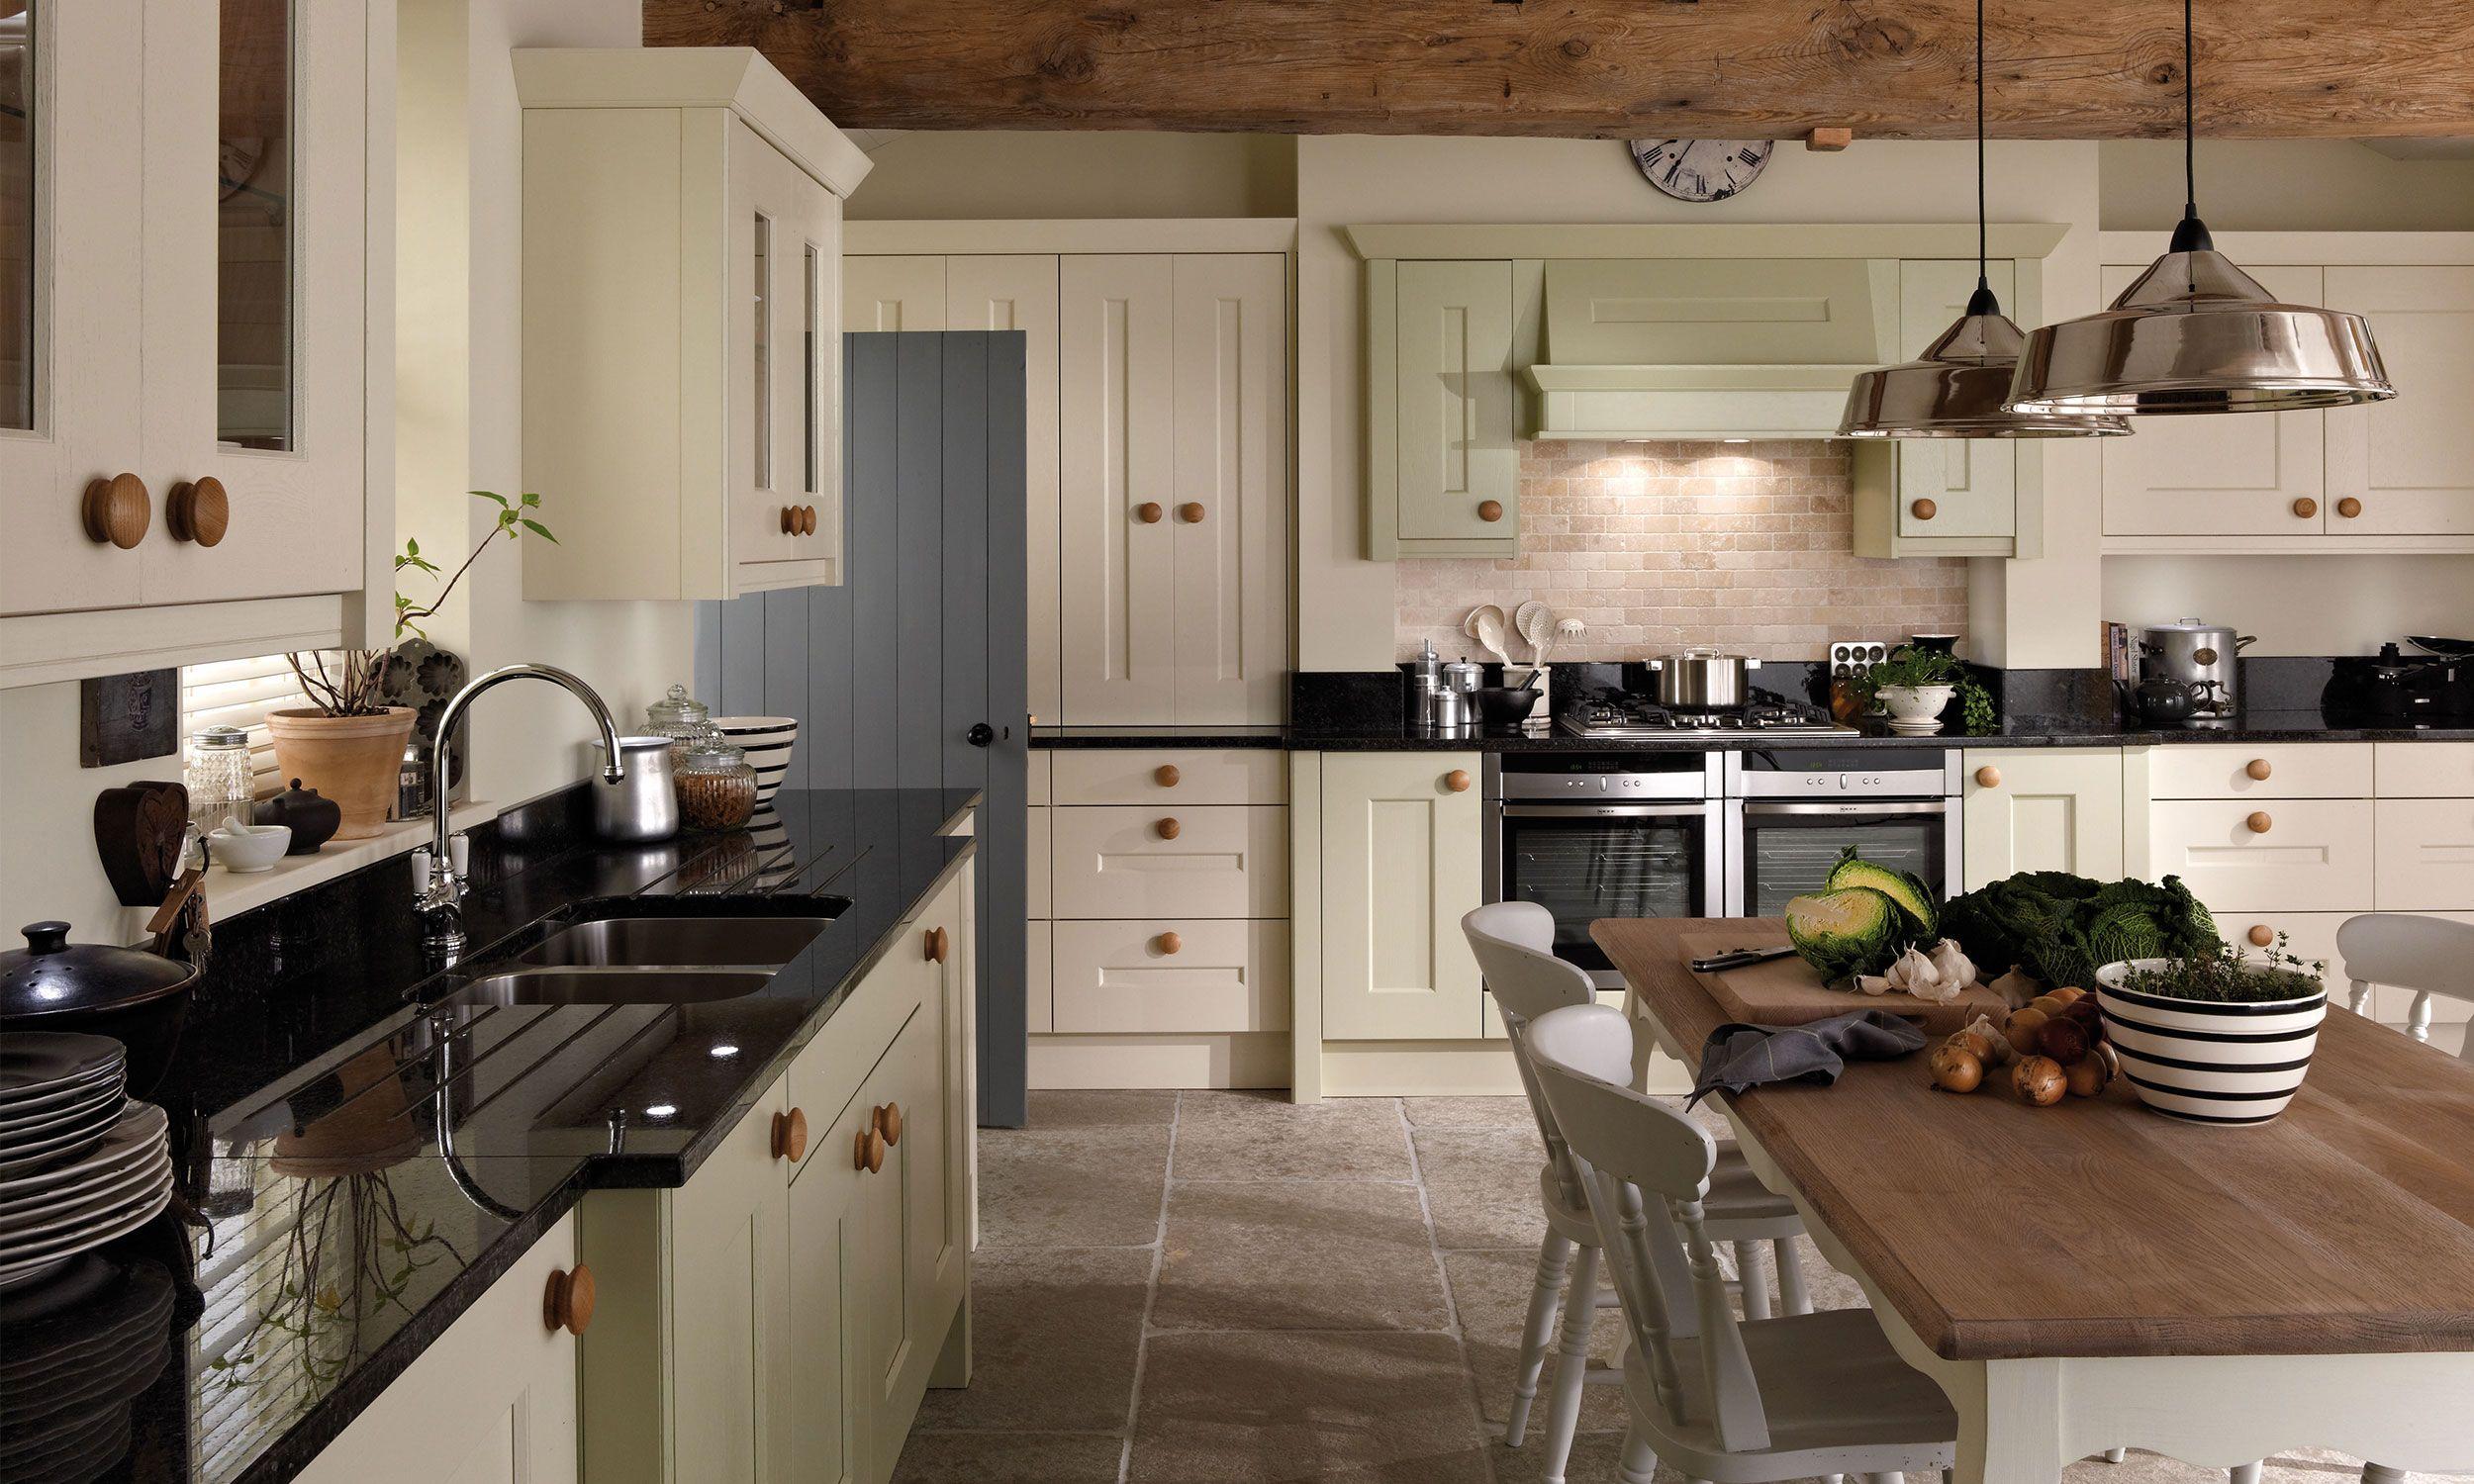 Langham Country kitchen, Kitchen inspirations, Stylish